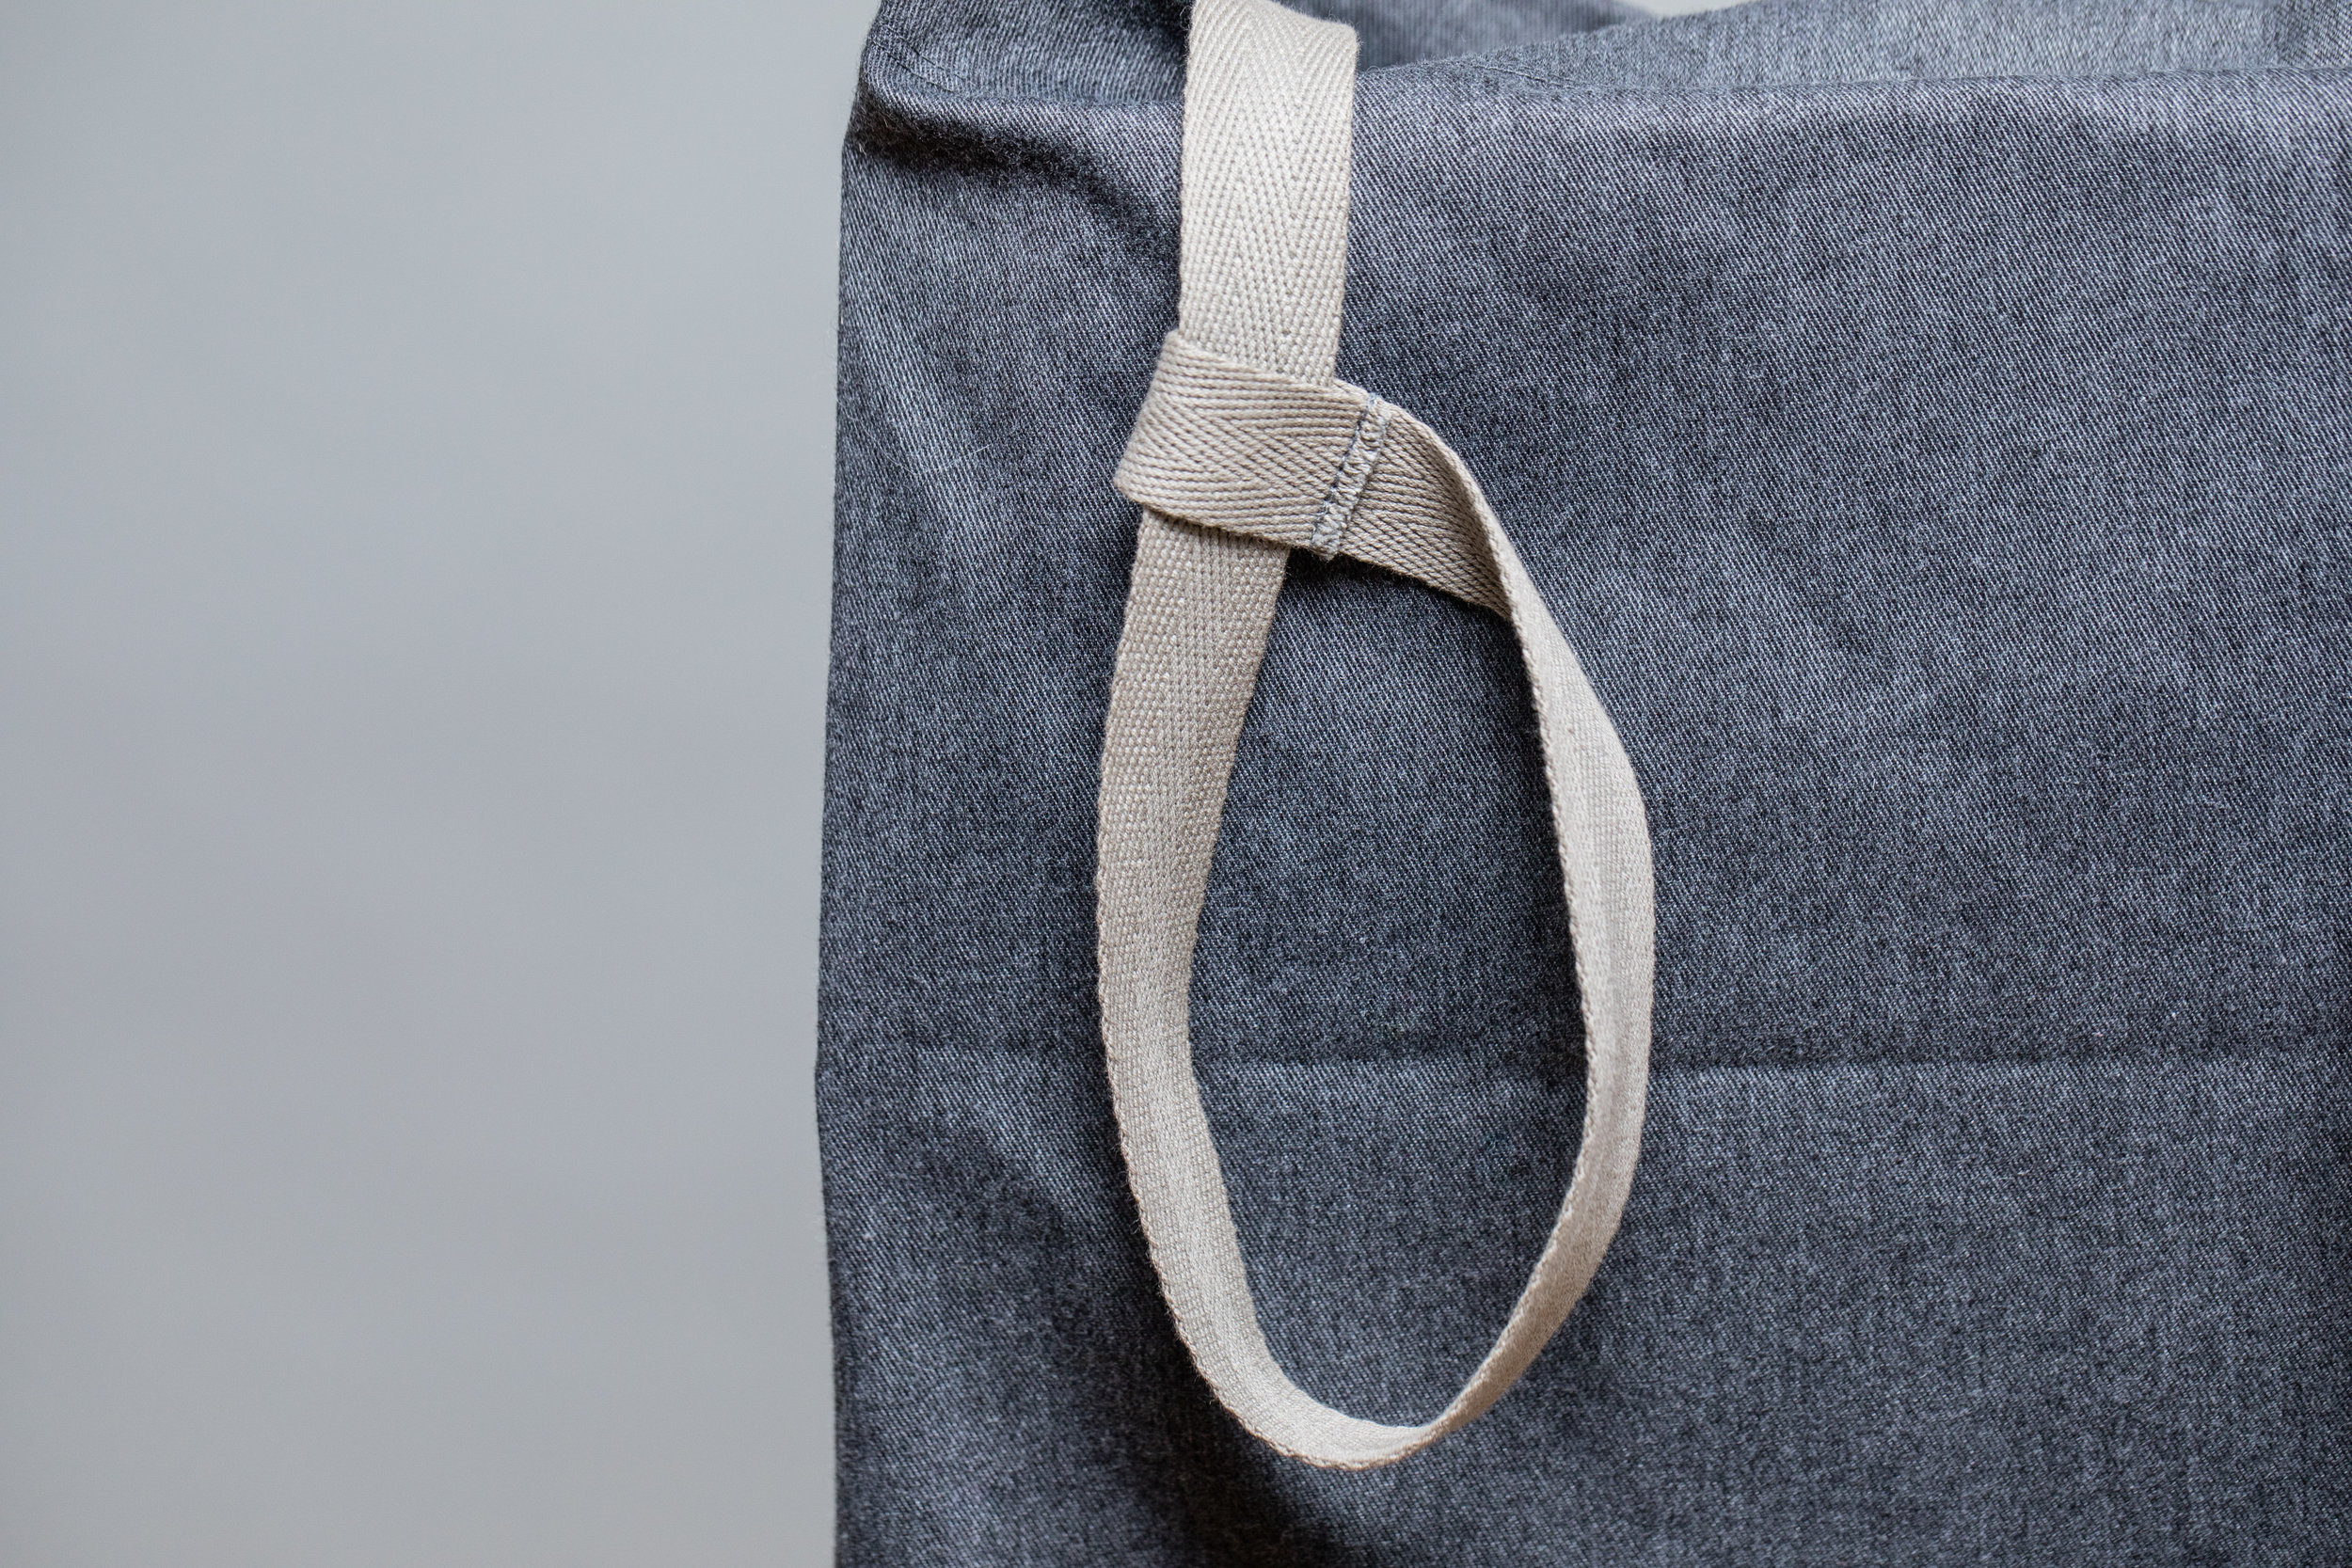 twists and turns tote bag nin detail hang side.jpg